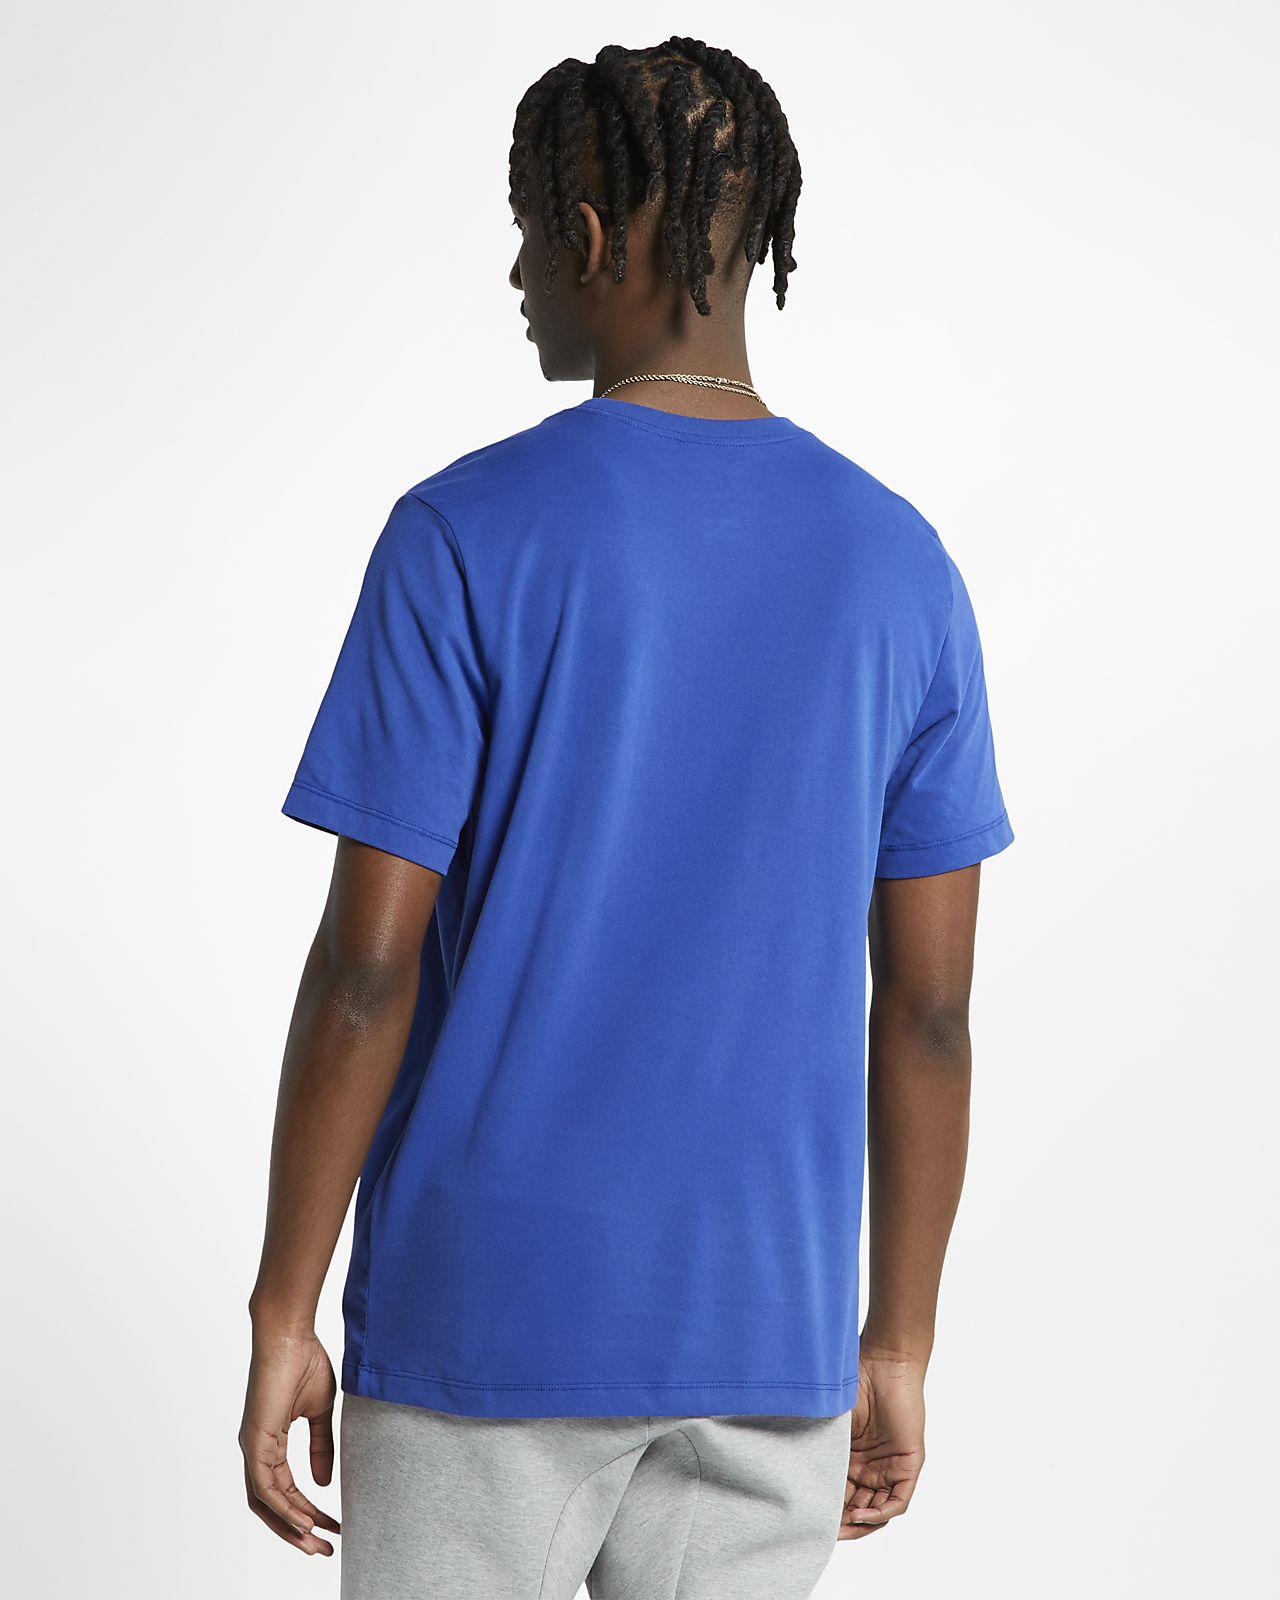 64346179 New York Knicks Nike Dri-FIT Men's NBA T-Shirt. Nike.com GB